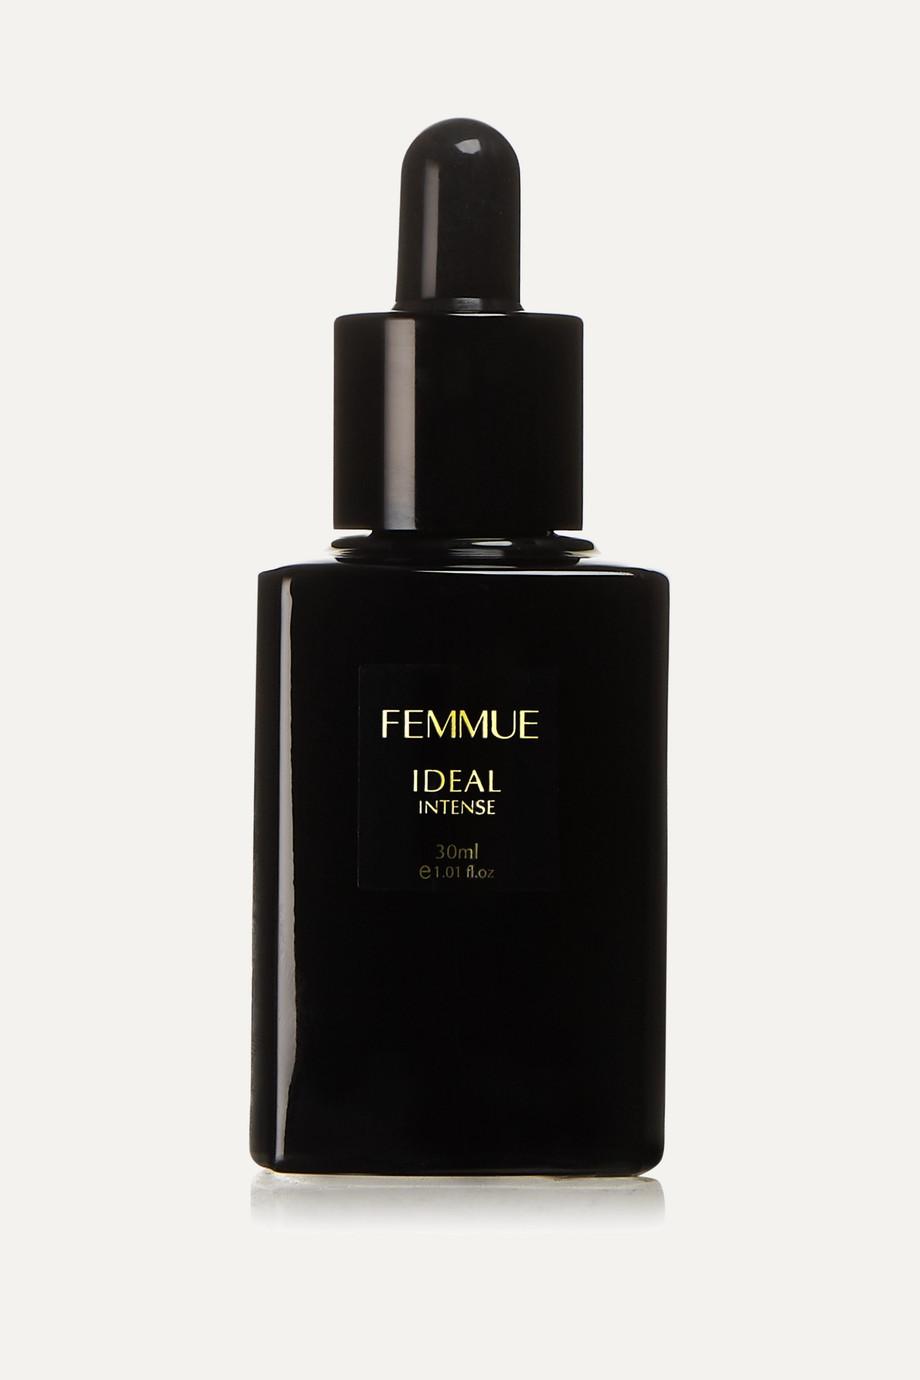 FEMMUE Ideal Intense Serum, 30ml